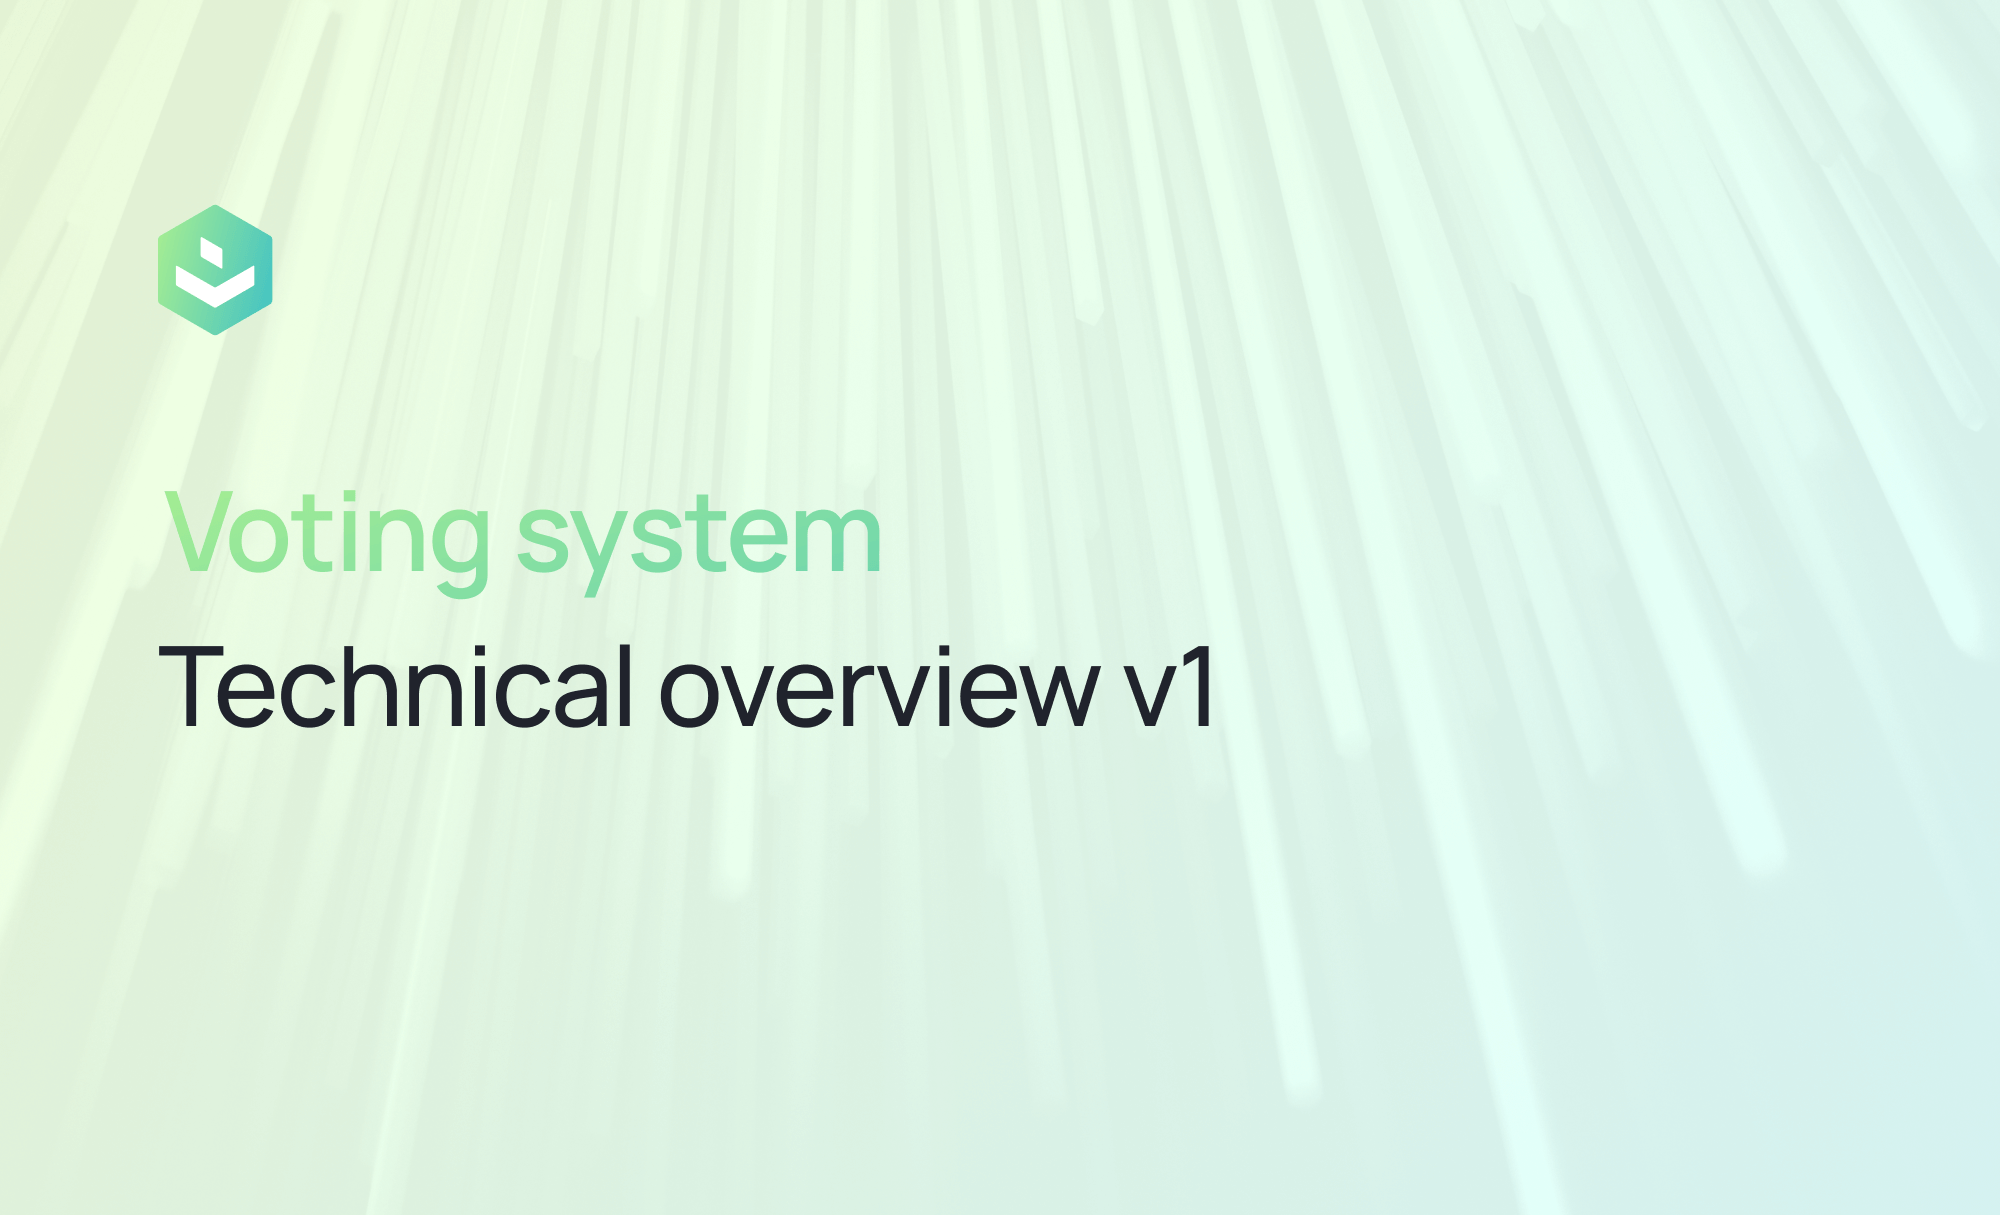 Vocdoni, voting system technical overview v1